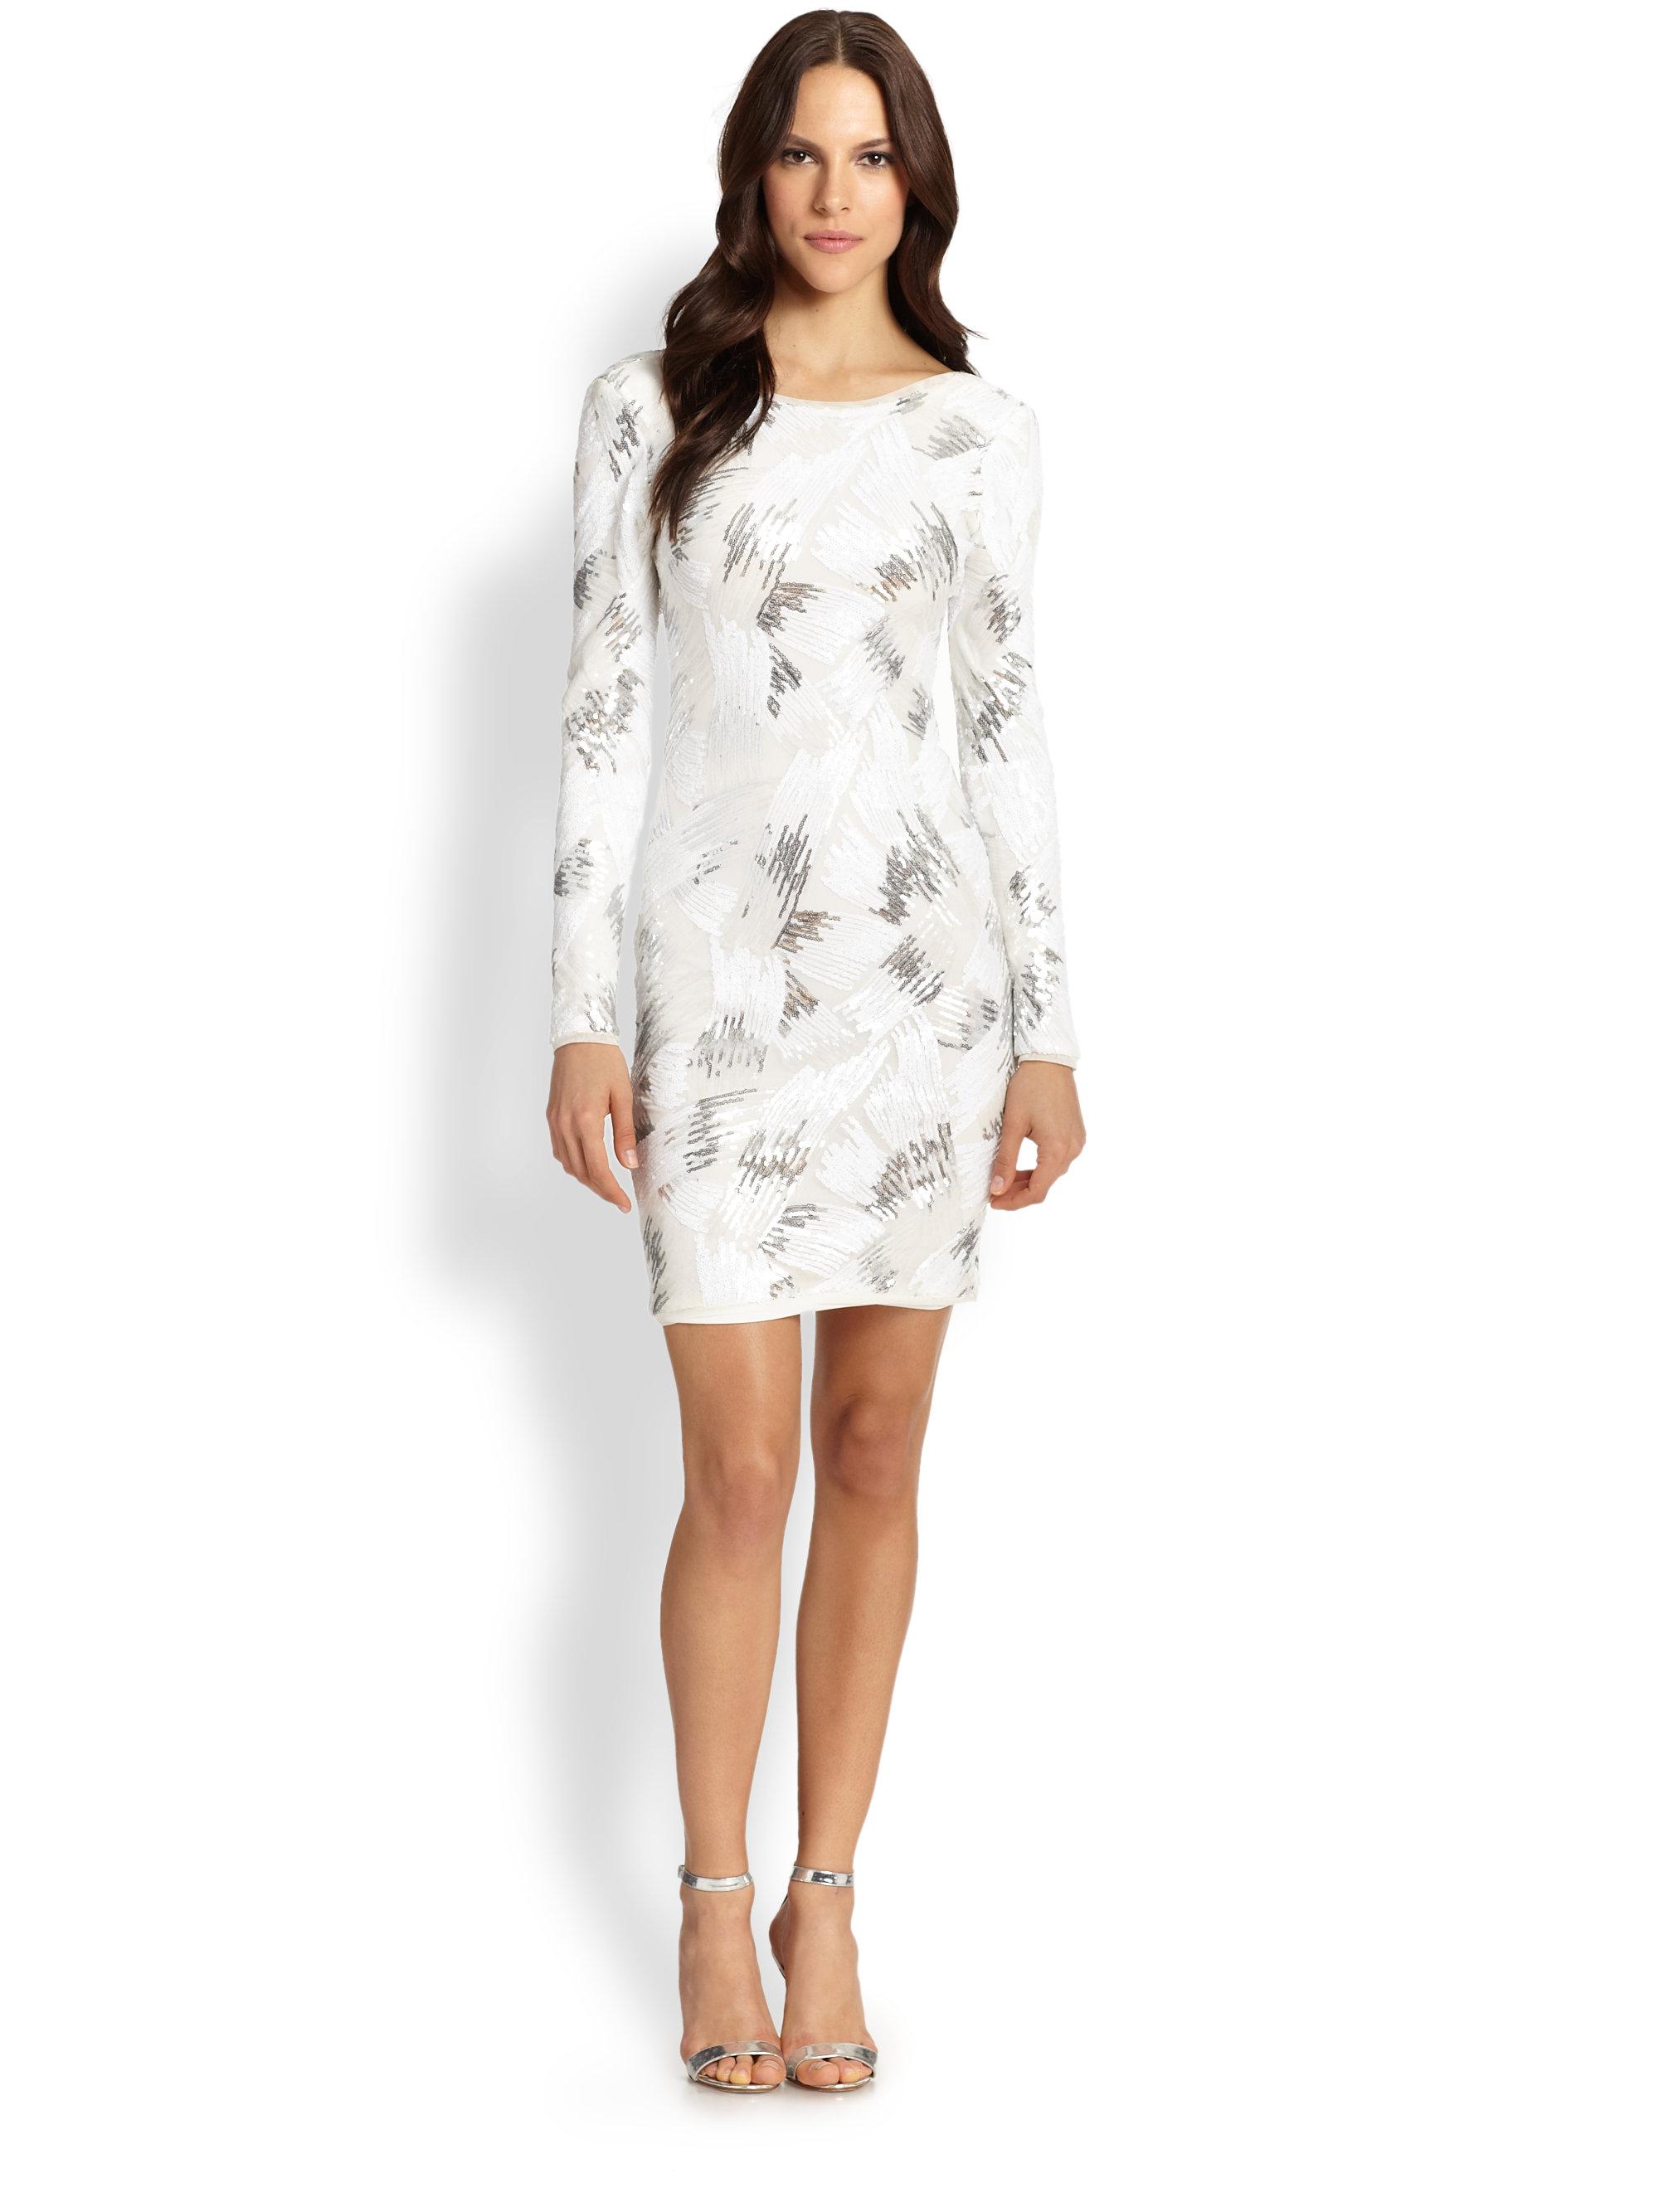 White Long Sleeve Cocktail Dress